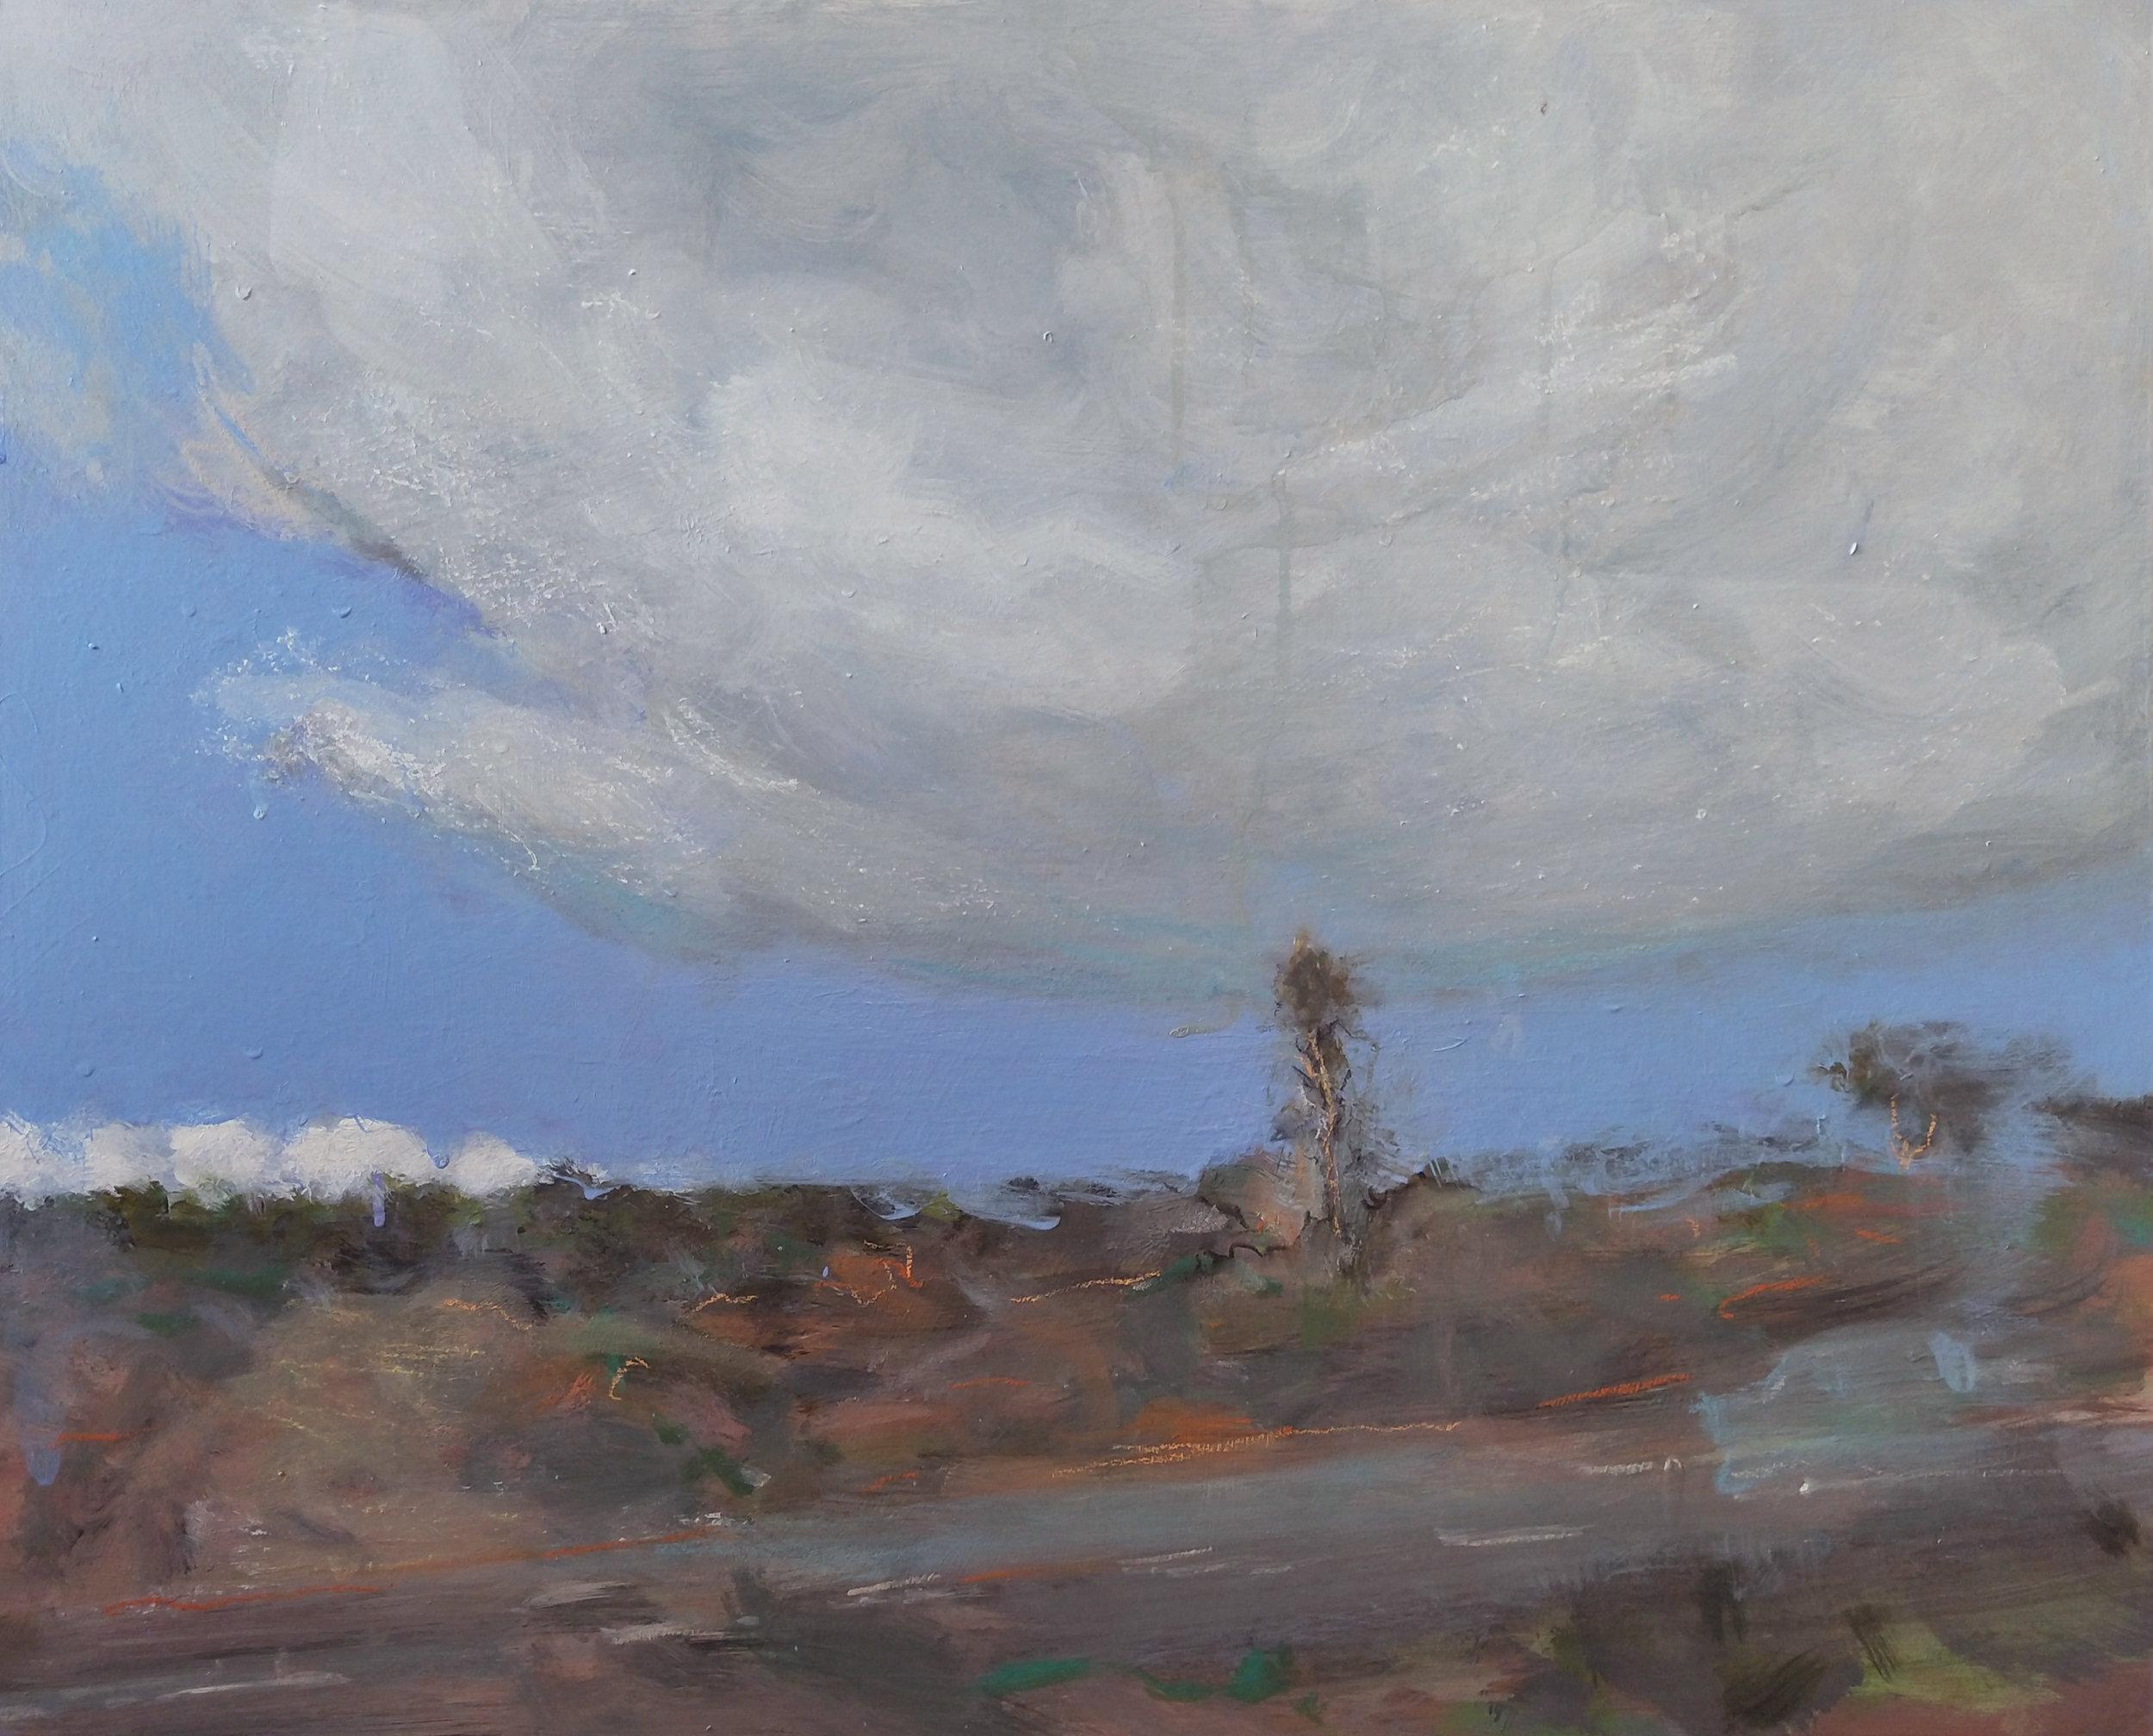 Big Fat Cloud. 2019. Acrylic on birch wood panel. 50 x 60 cm.$3,500 SOLD